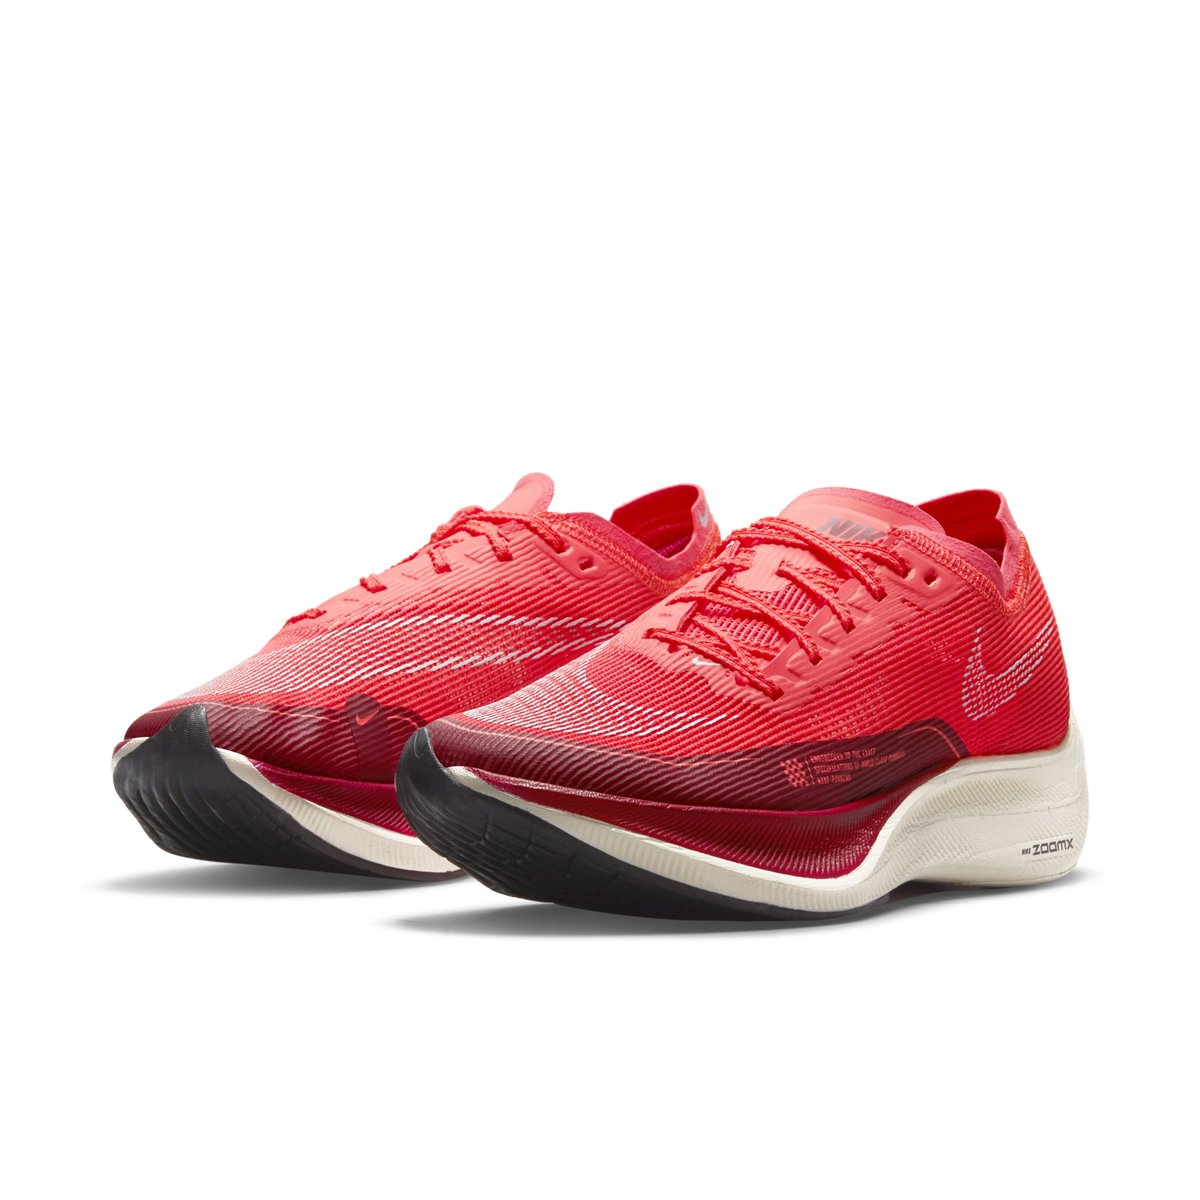 Nike,ZoomX Vaporfly NEXT% 2,曝光  耀眼的一抹红!Nike 旗舰跑鞋 NEXT% 2 新配色曝光!